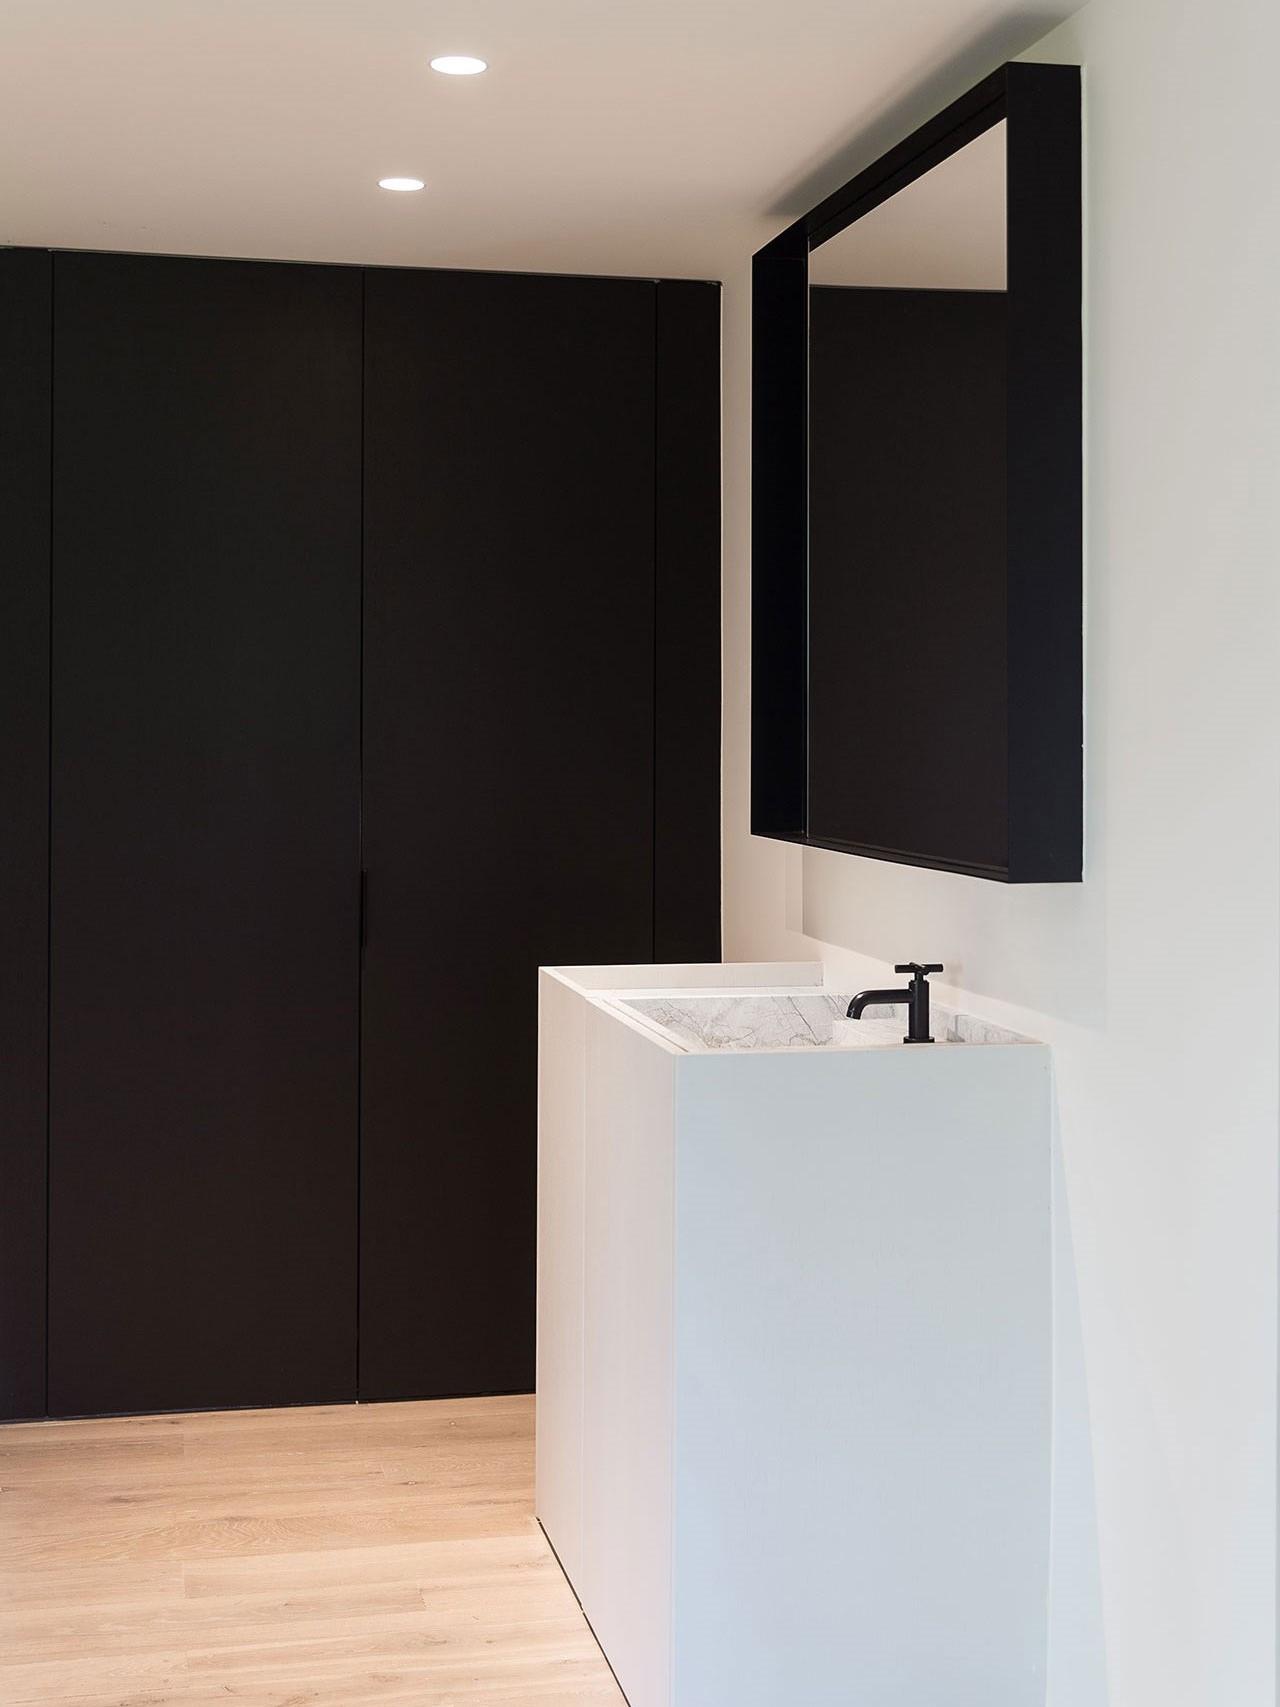 totaalinrichting-badkamer-haard-vestiaire-marmer-3.jpg